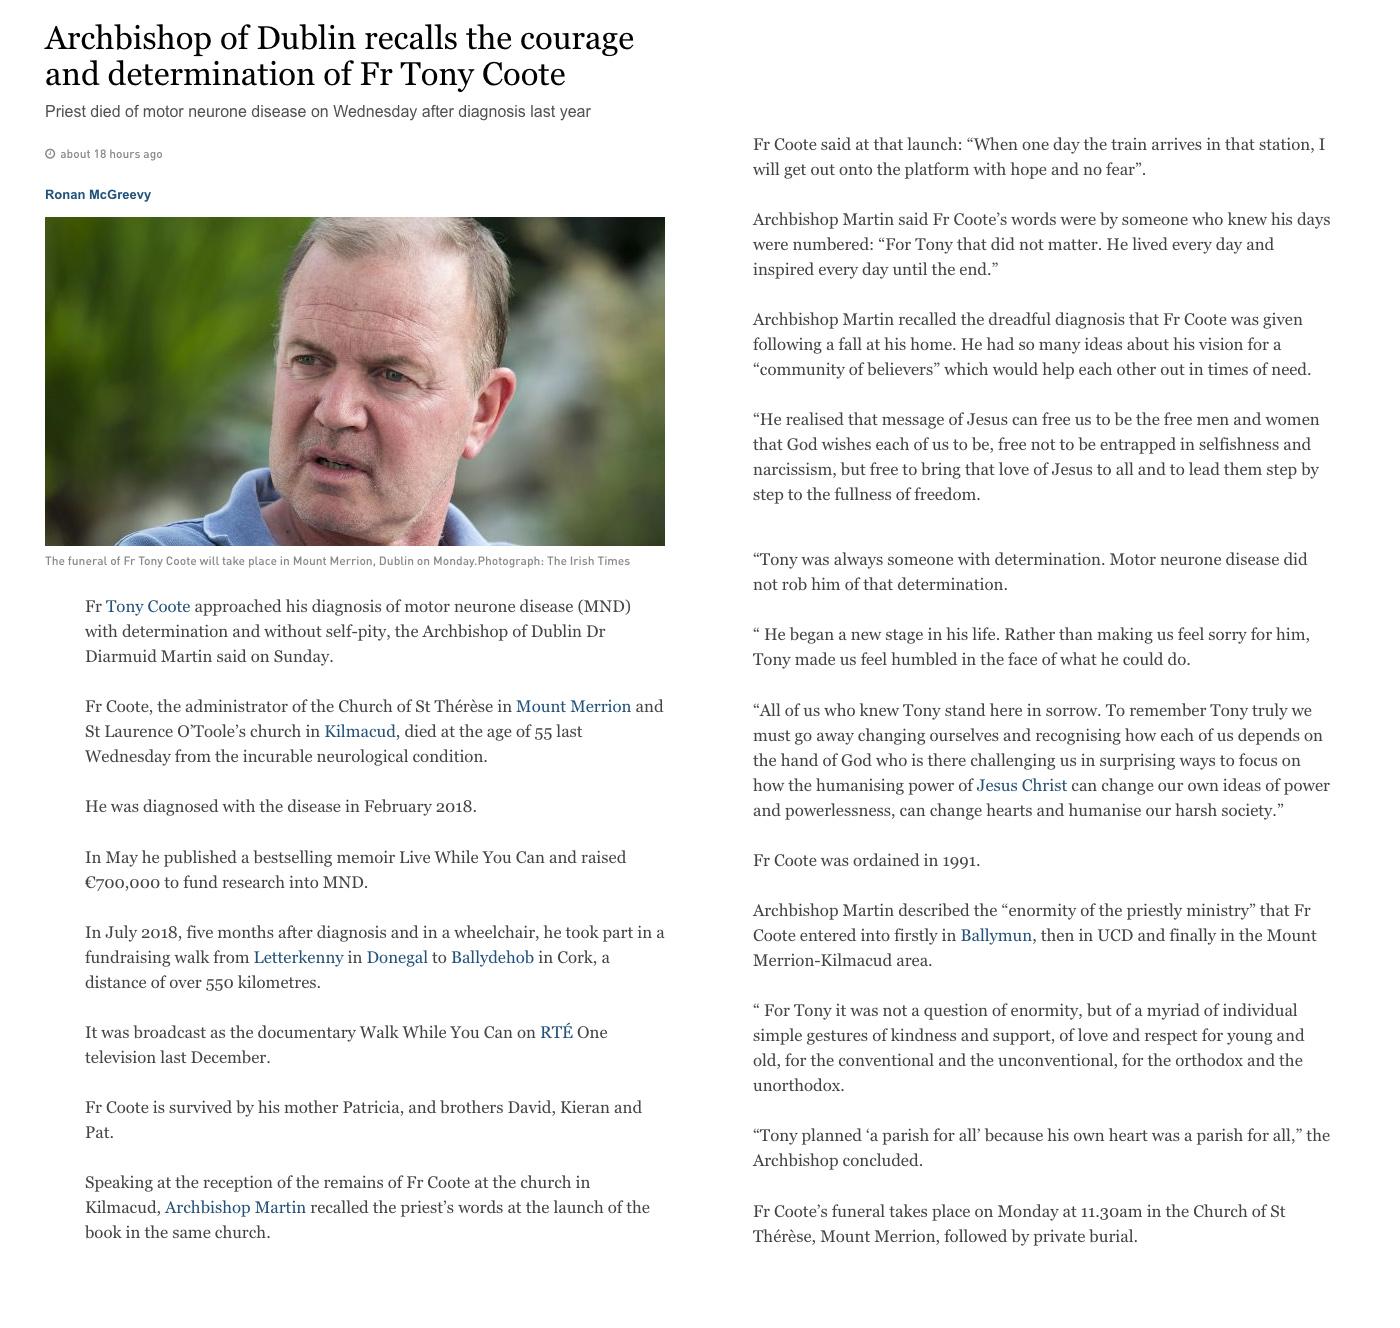 https://www.irishtimes.com/news/ireland/irish-news/archbishop-of-dublin-recalls-the-courage-and-determination-of-fr-tony-coote-1.4004080